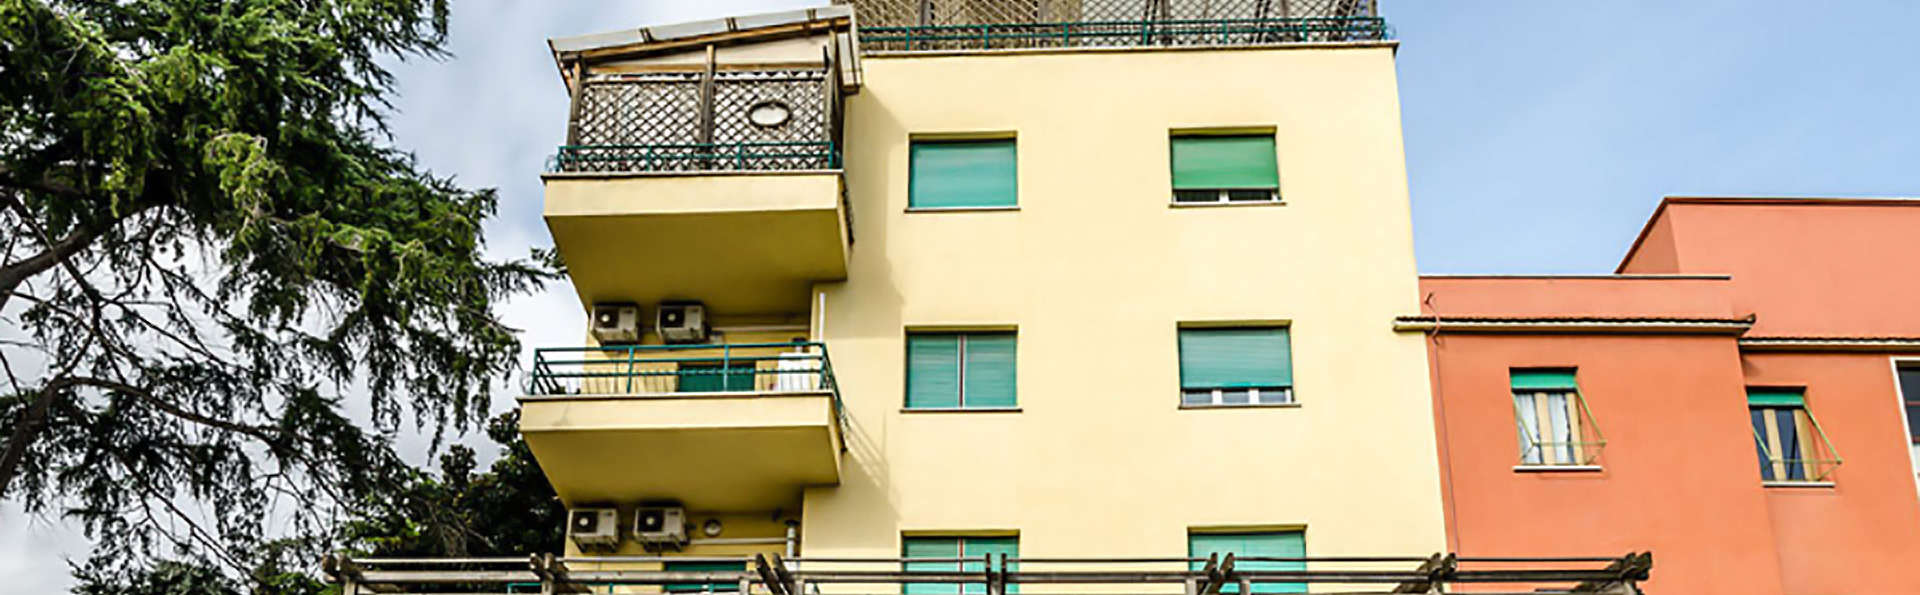 Hotel Antico Acquedotto - Edit_Front2.jpg